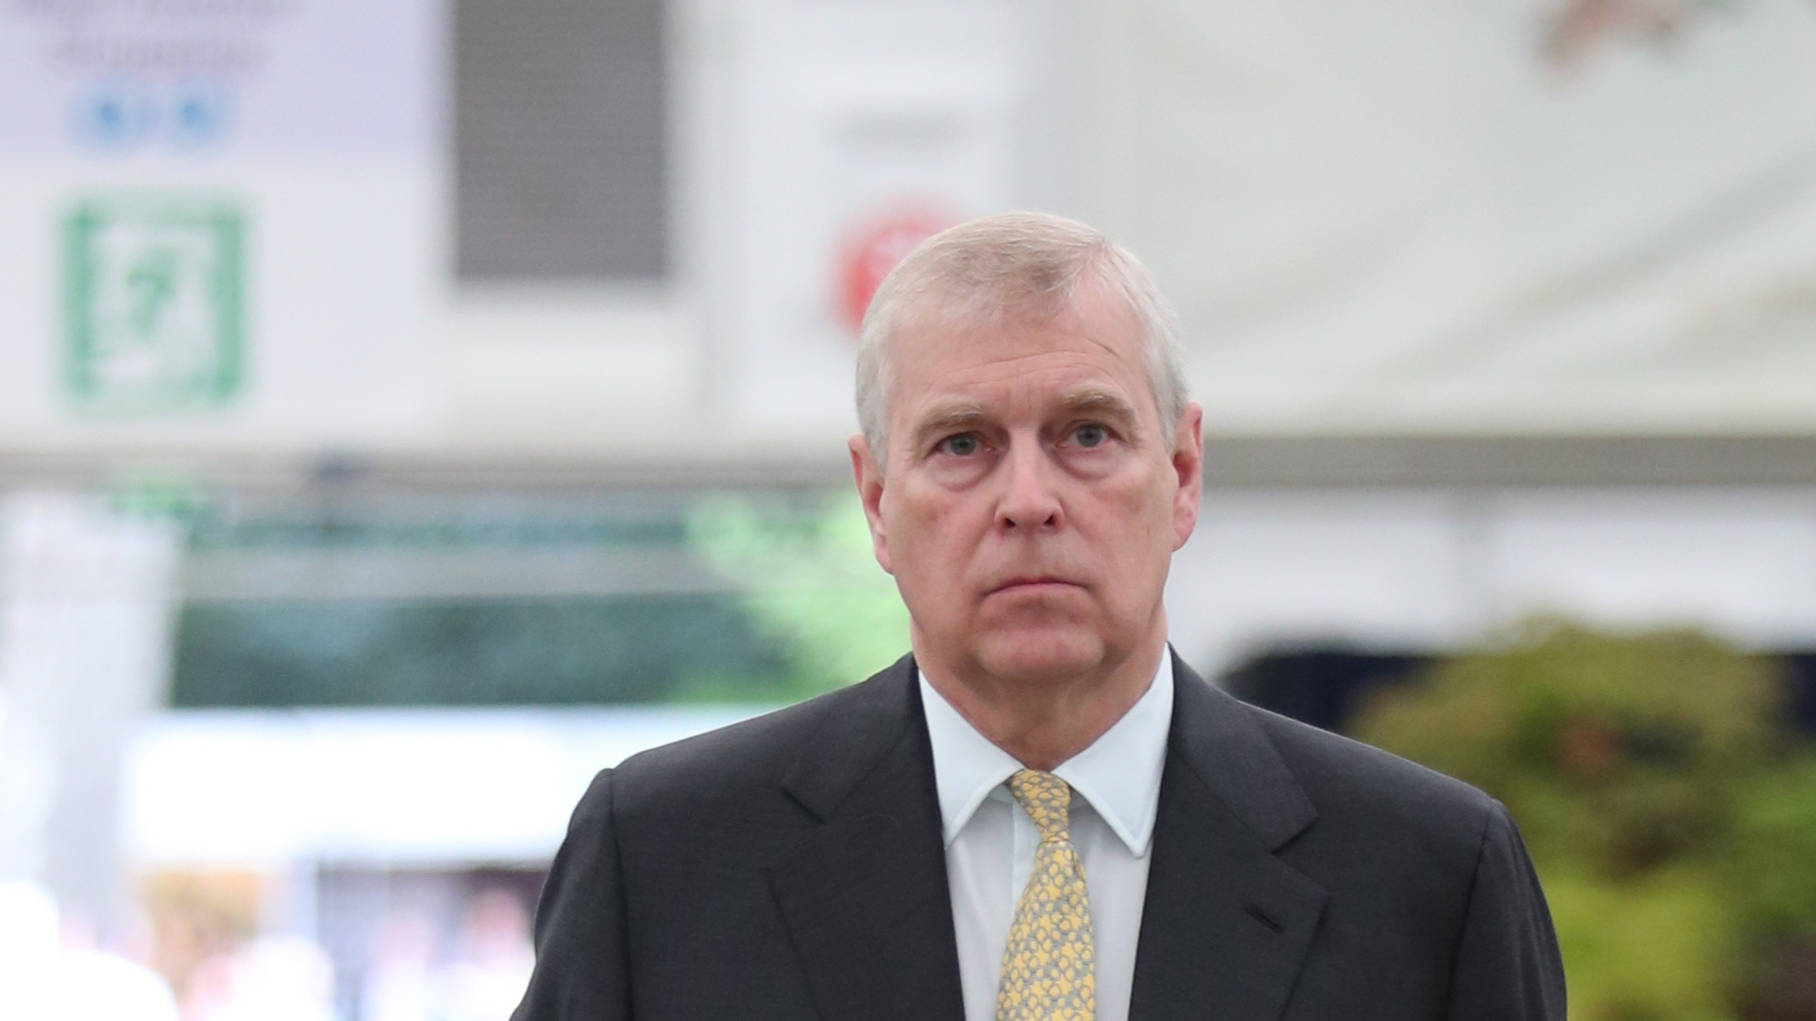 Prince Andrew Denies Meeting Epstein Accuser Virginia Roberts In